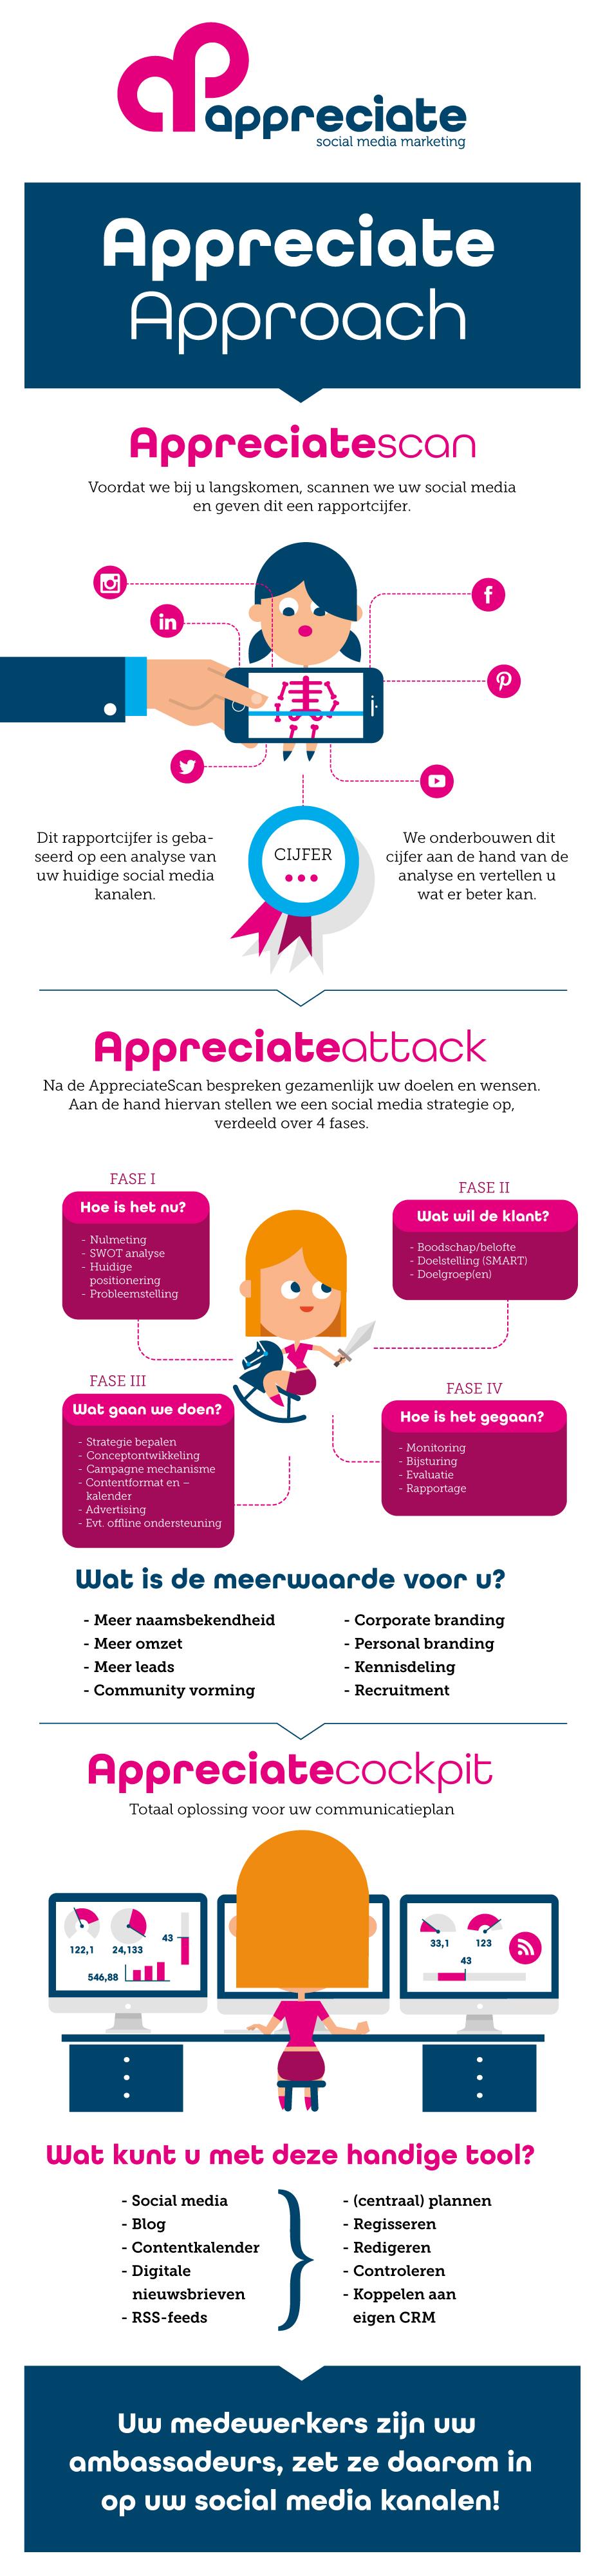 infographic laten maken, animatie laten maken, freelance illustrator, reclamebureau rotterdam, animatie laten maken Rotterdam